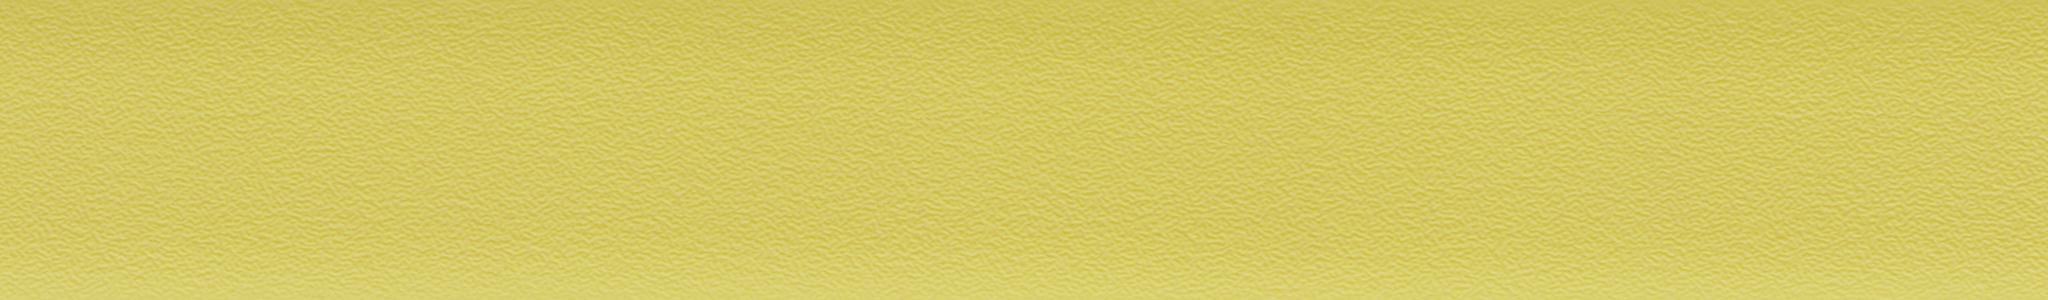 HU 161100 кромка ABS зеленая жемчуг 101